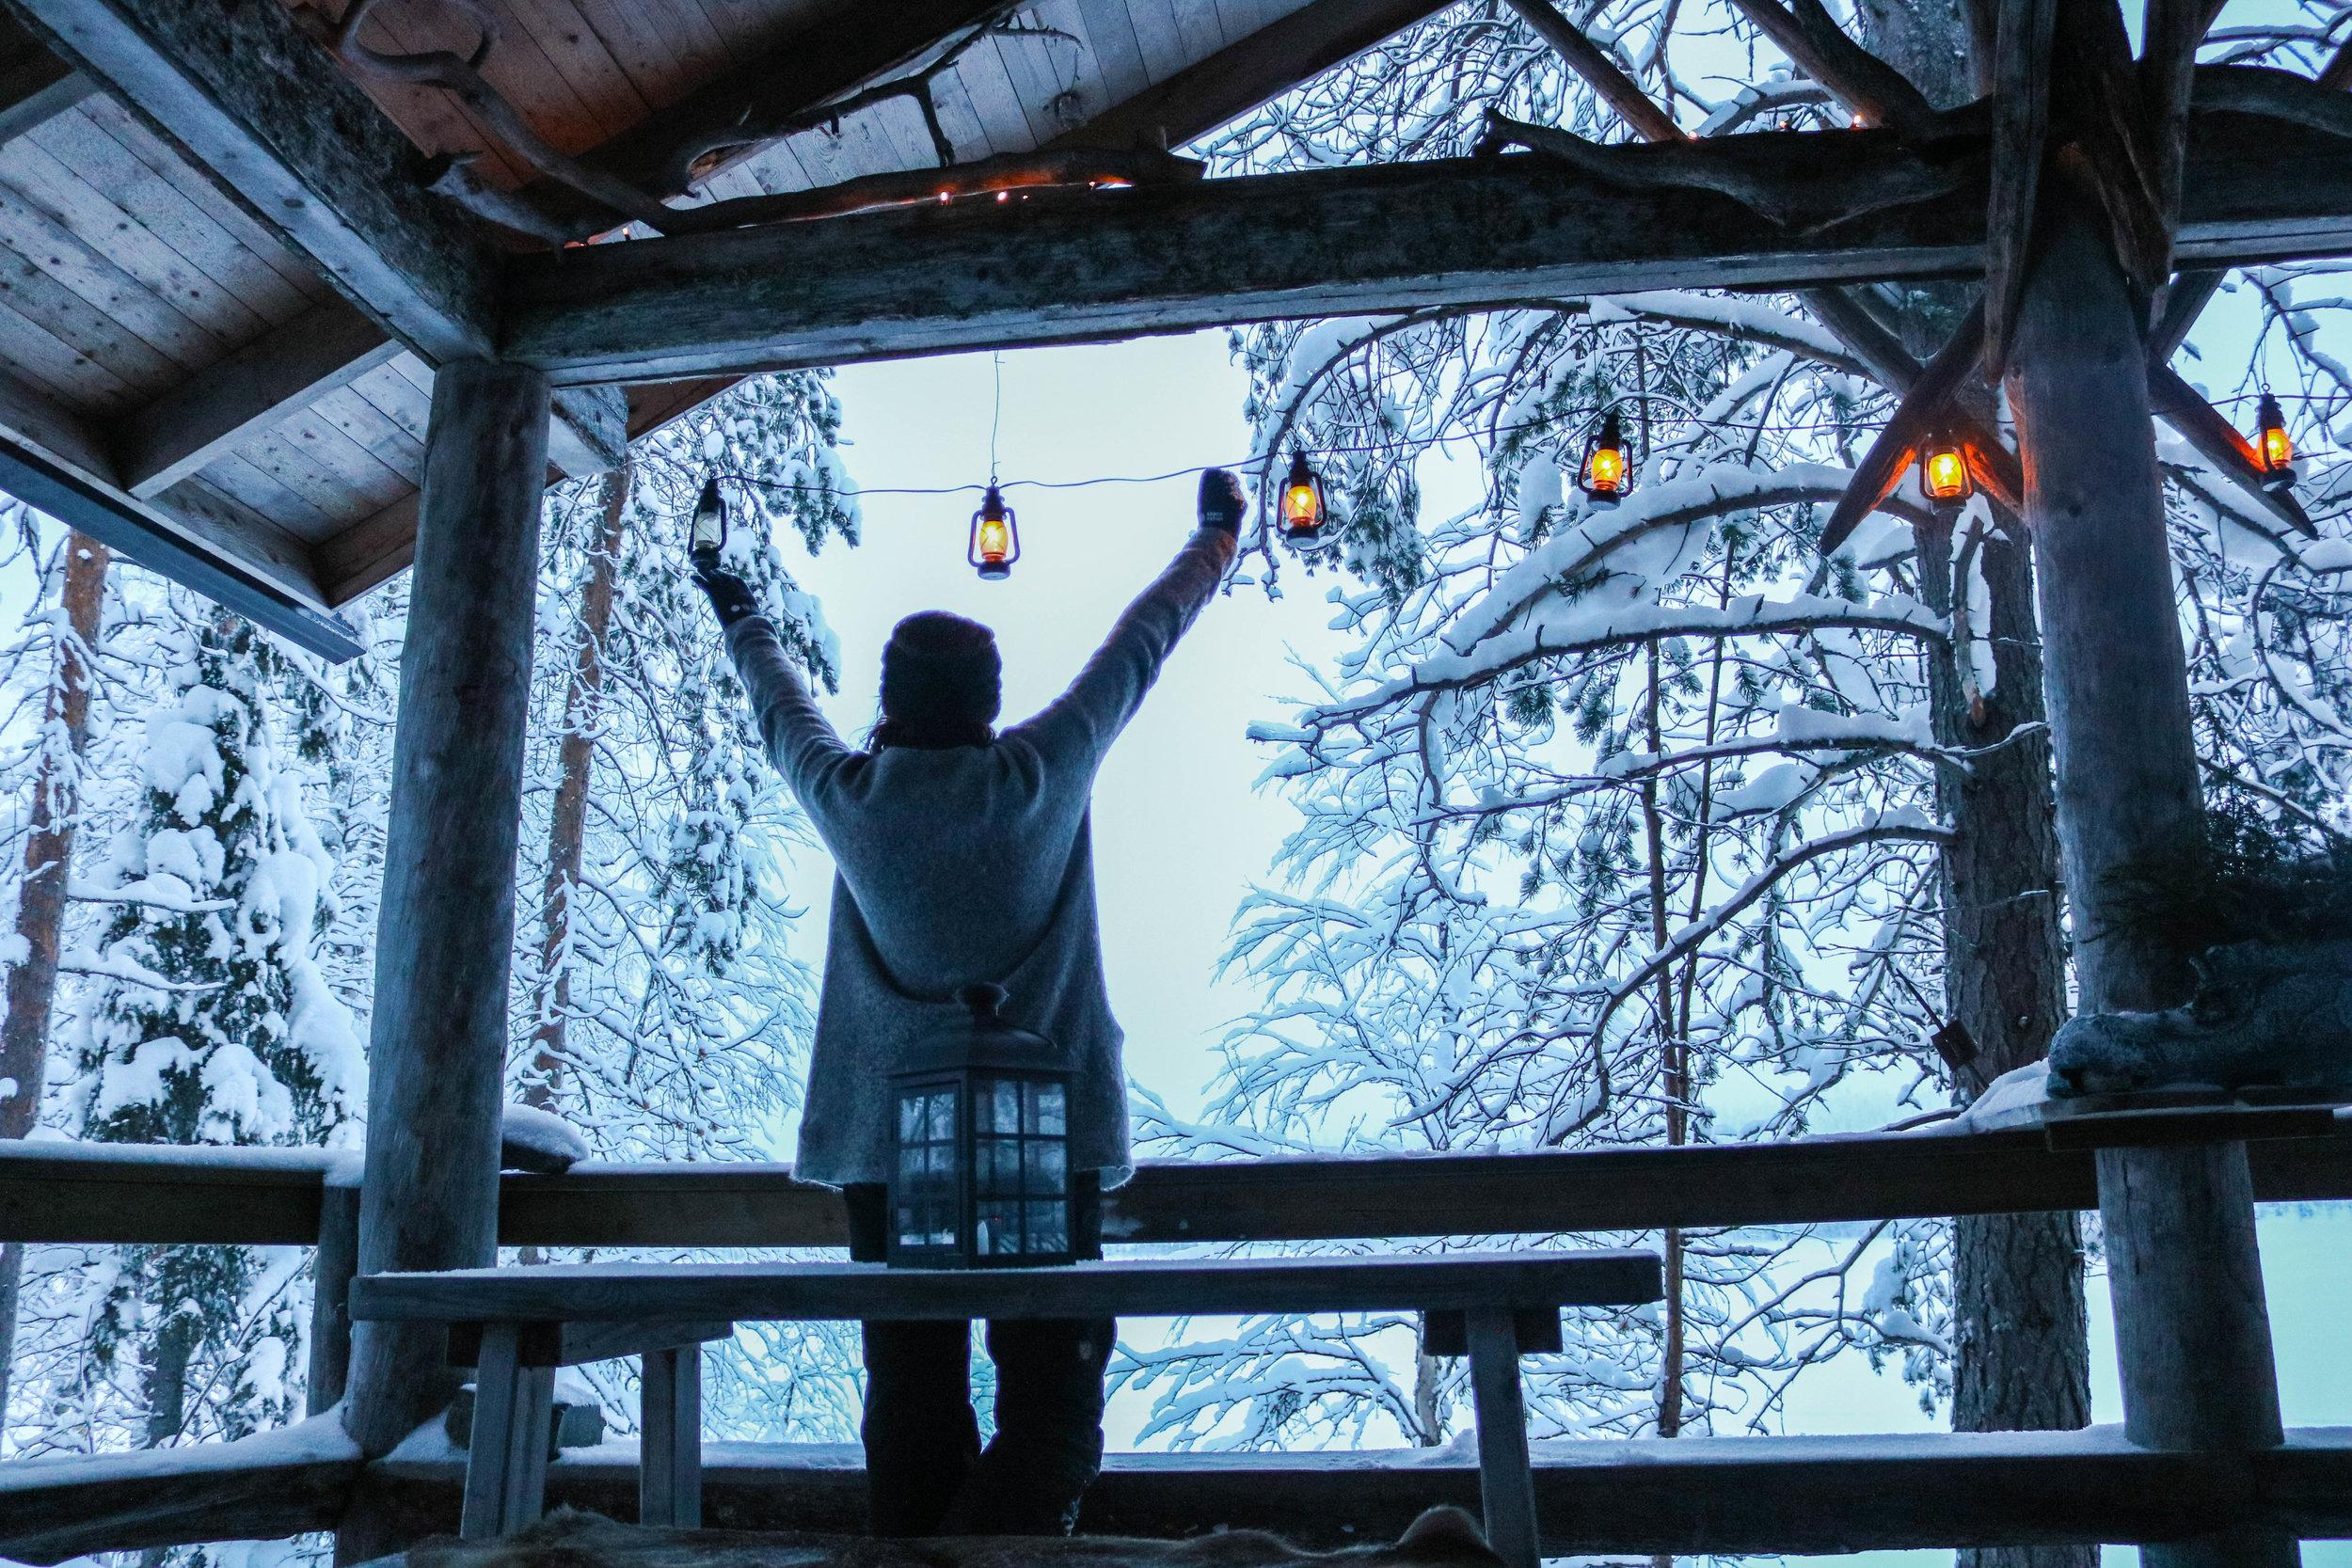 cabin holiday finnish lapland